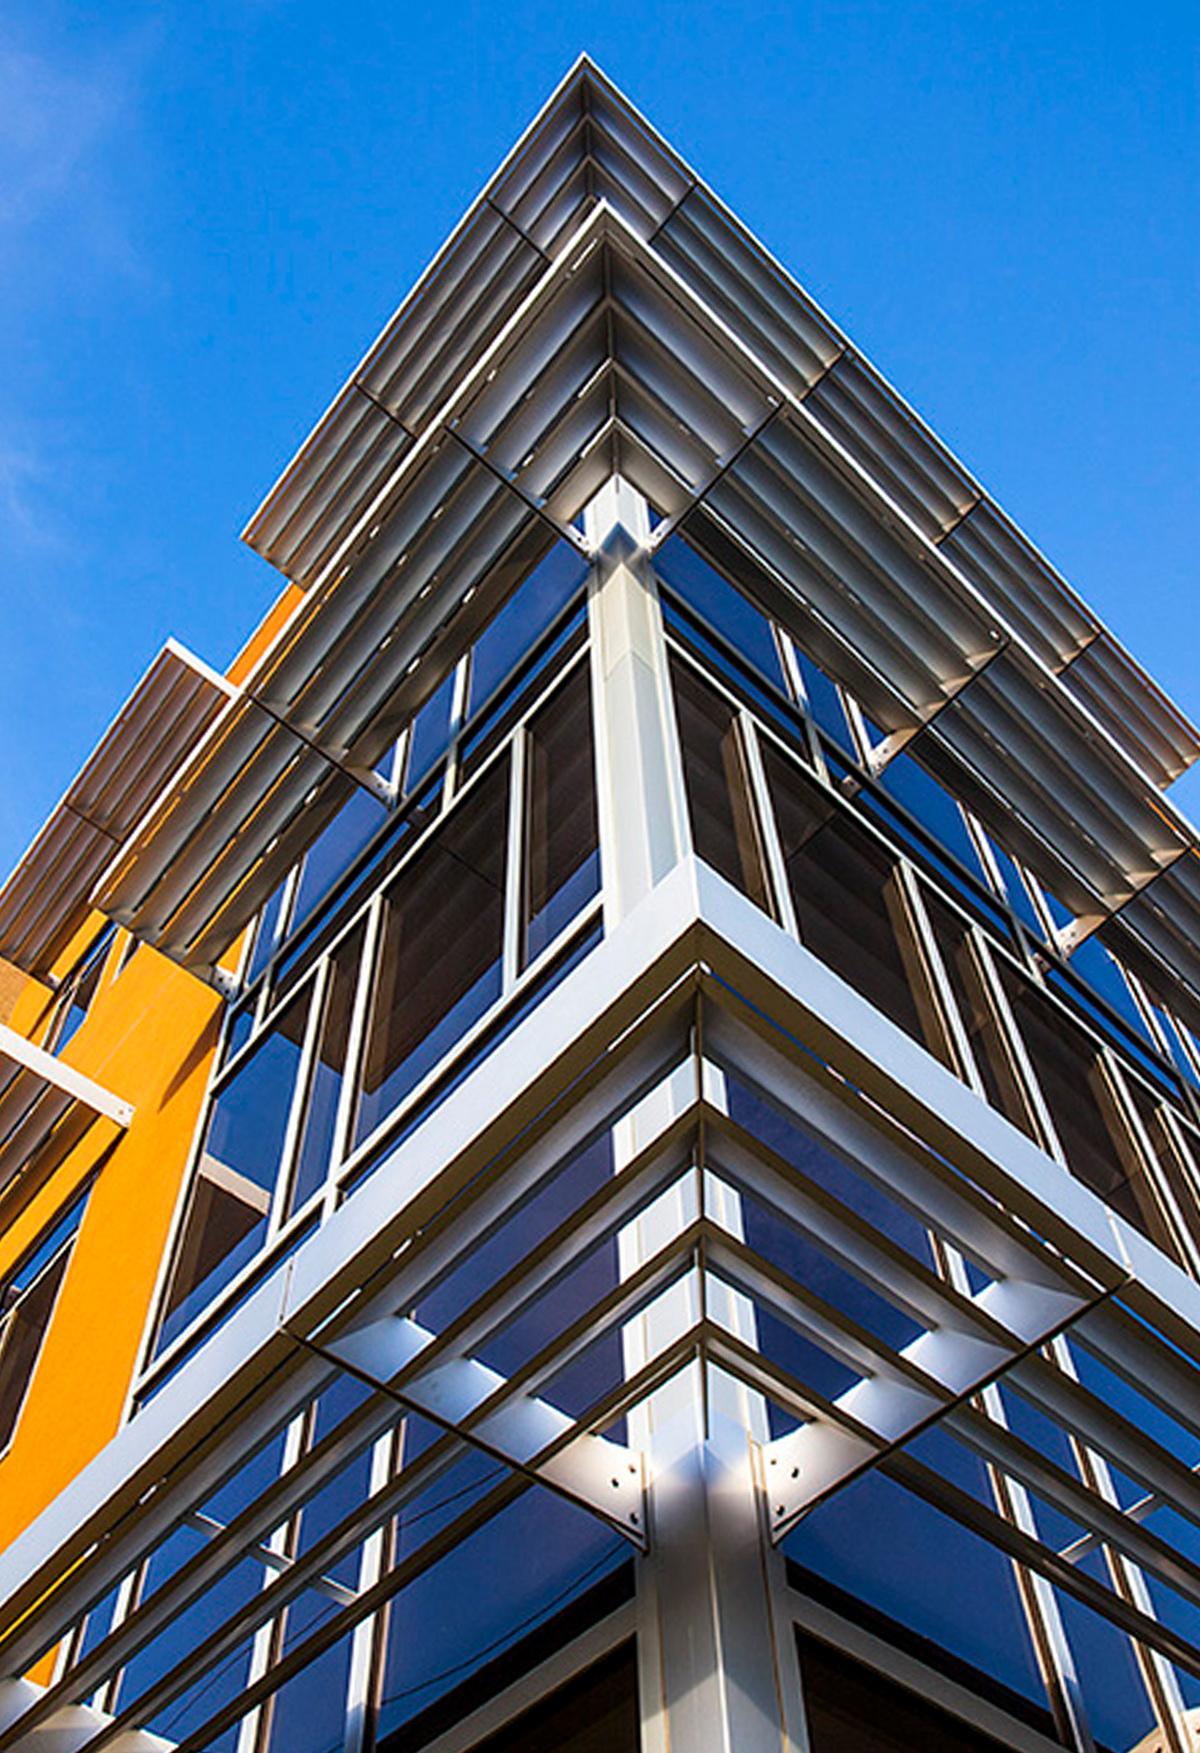 Kawneer Curtain Wall Systems Home Design Ideas